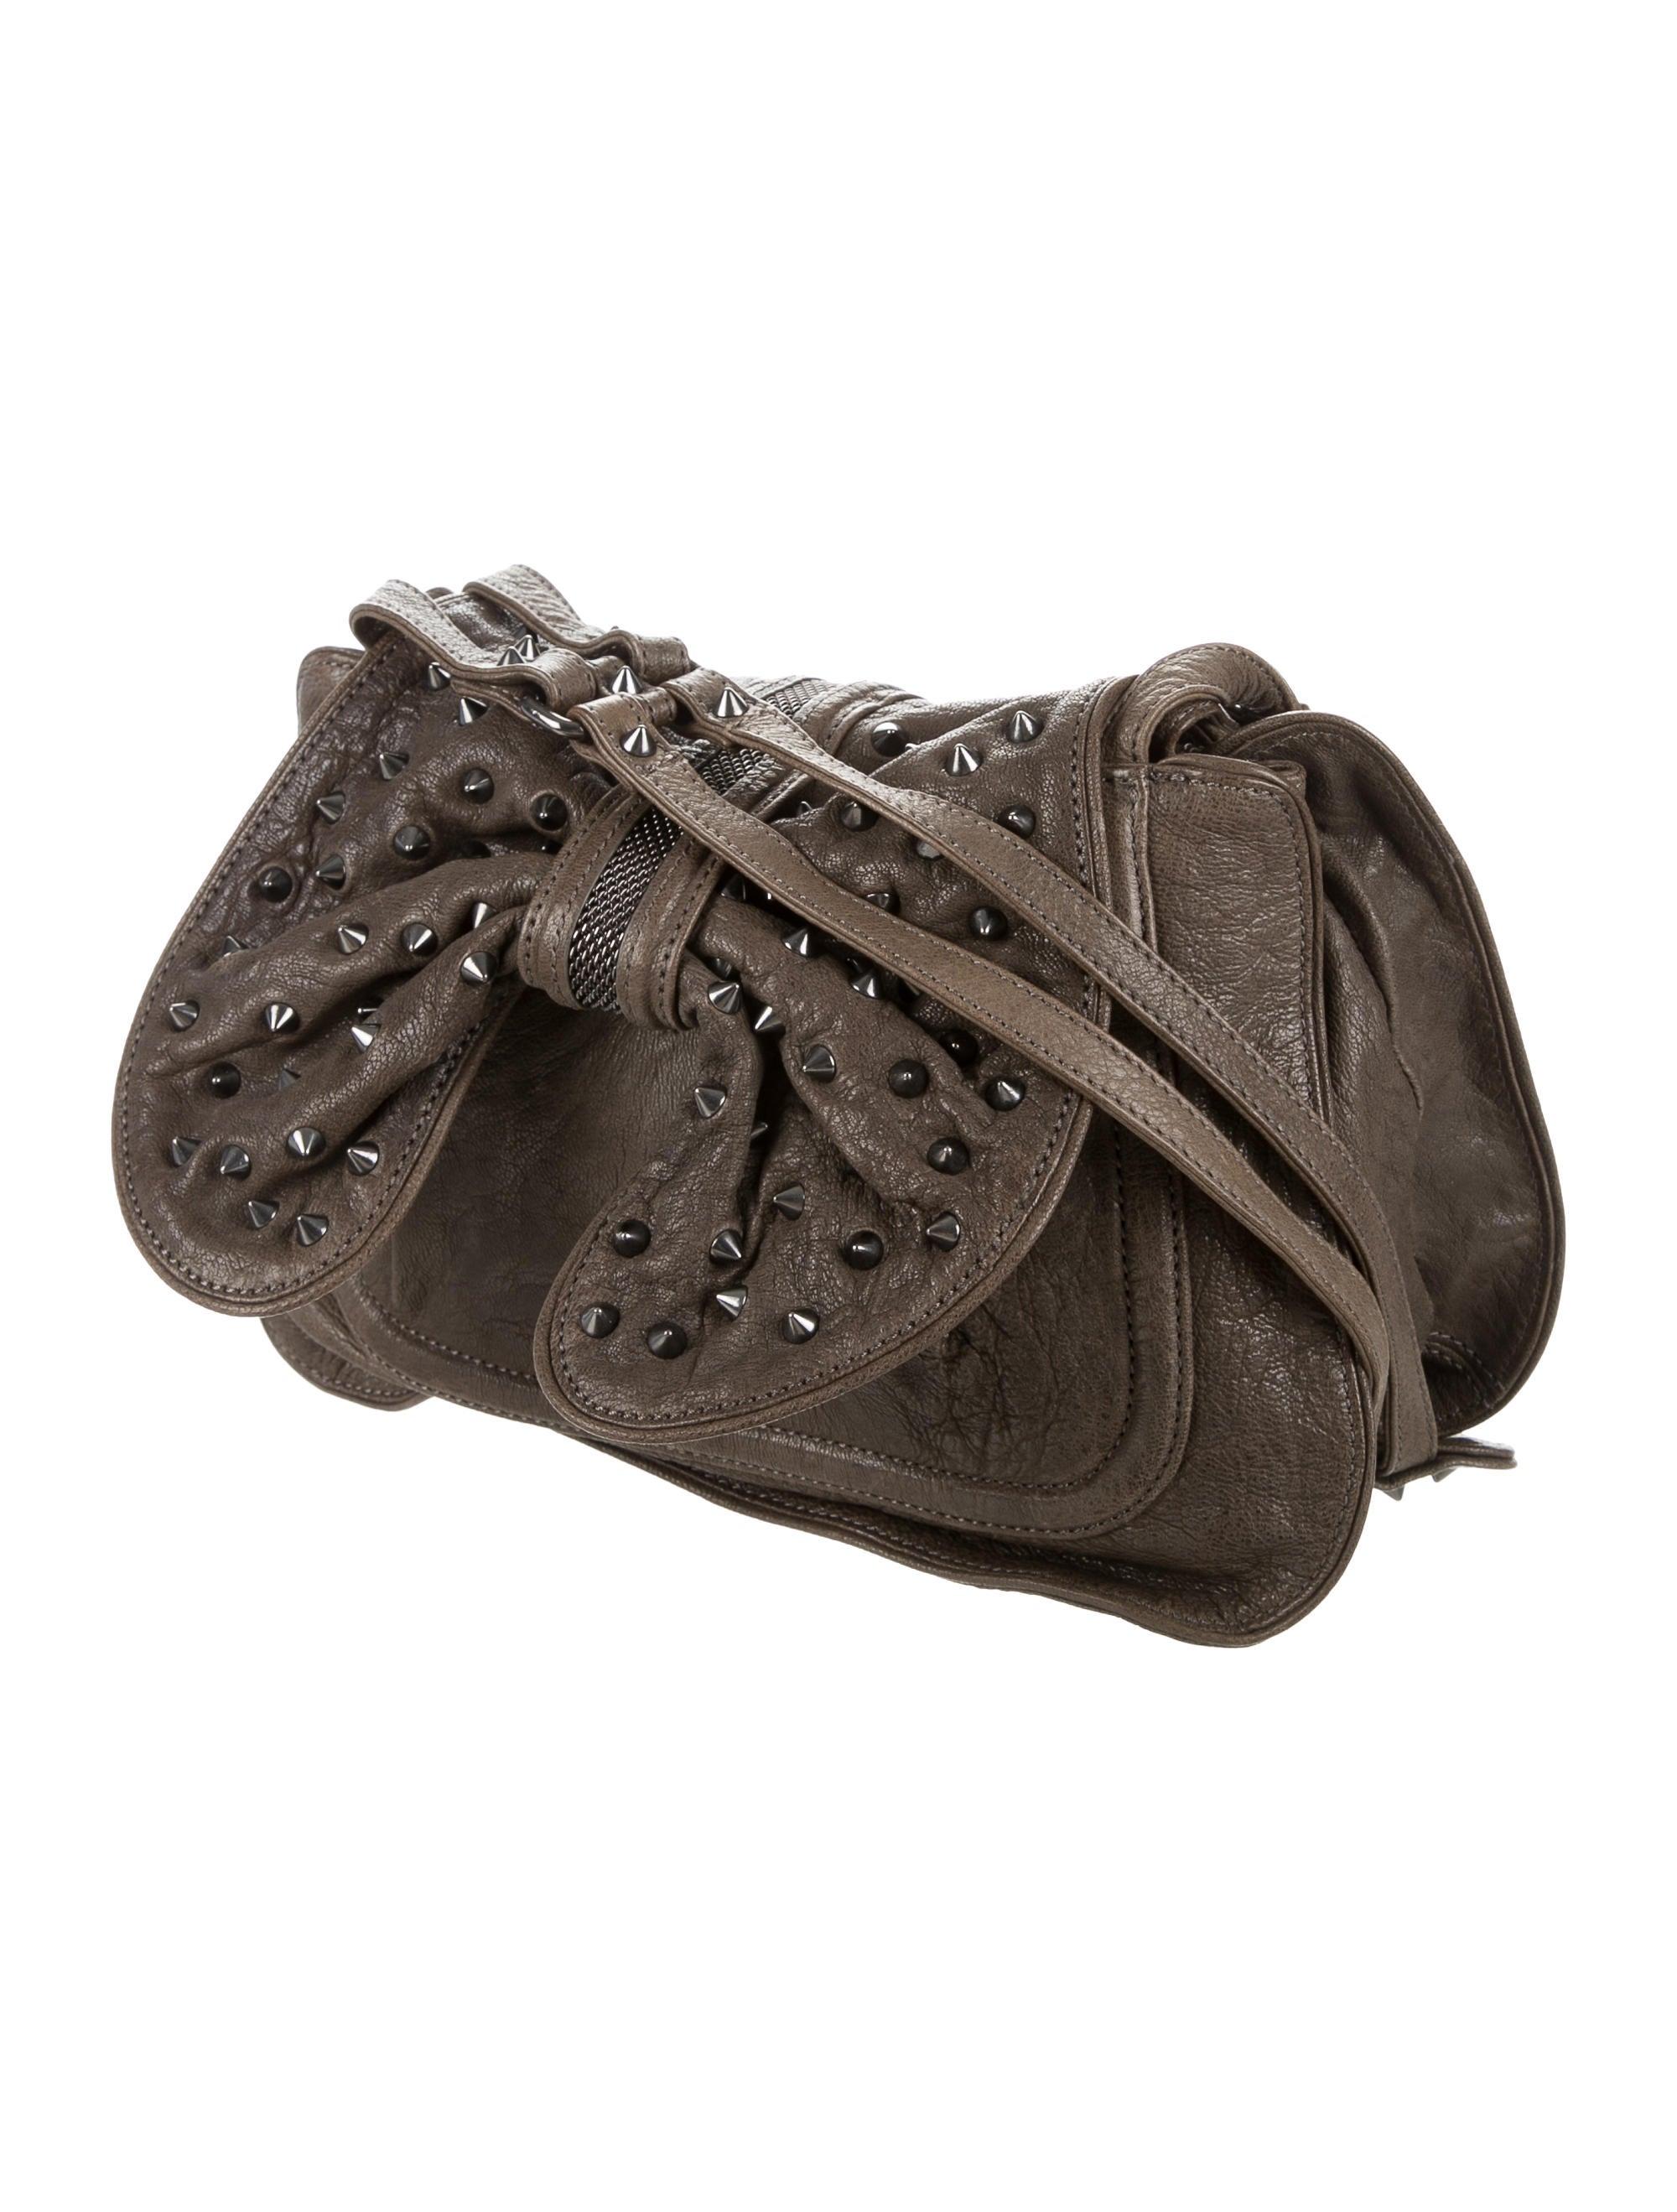 3.1 Phillip Lim Edie Bow Bag - Handbags